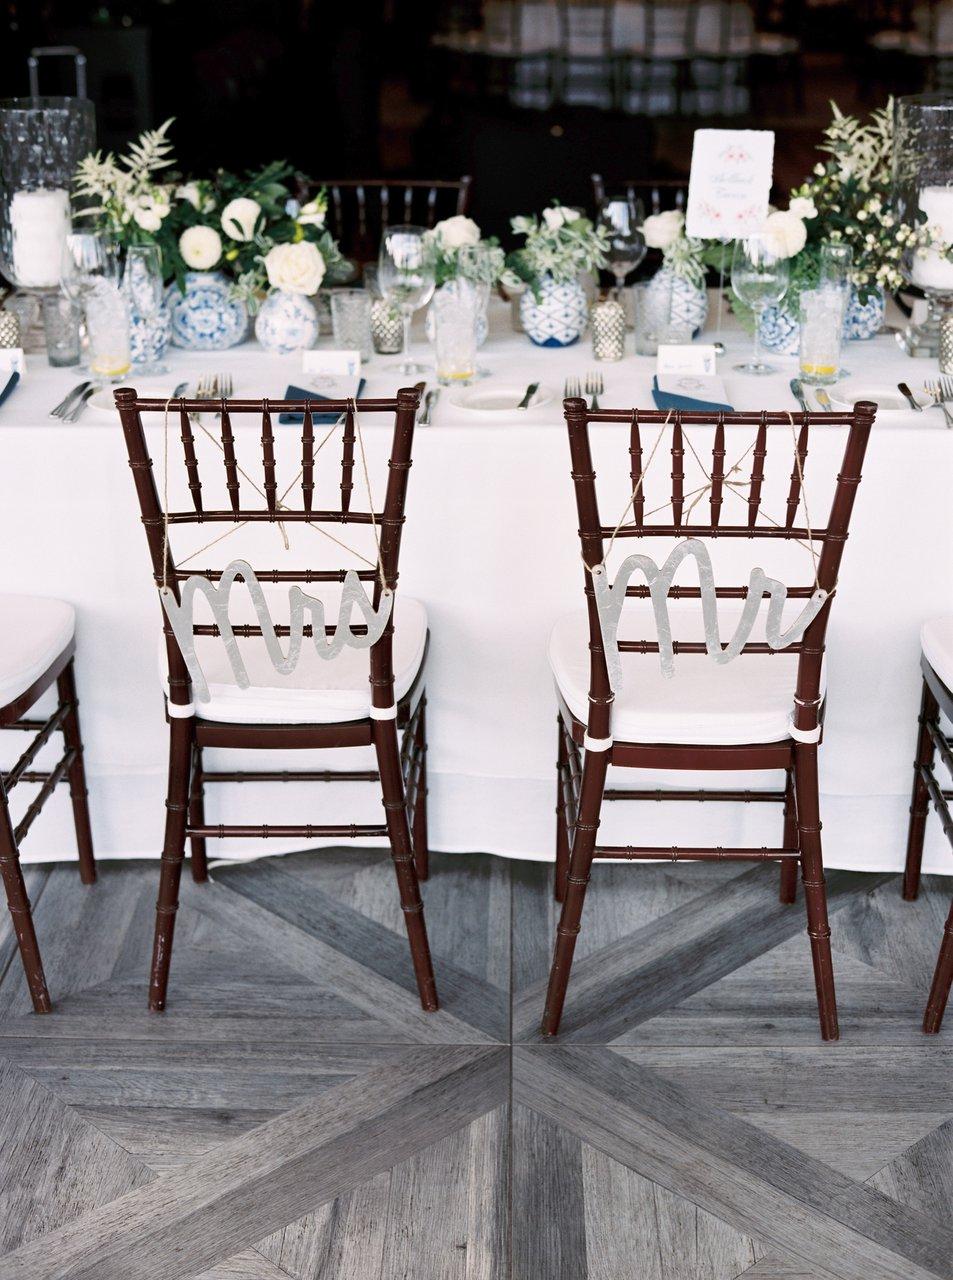 Ali & Pete Wedding photo 1558400375886_06701_13.jpg